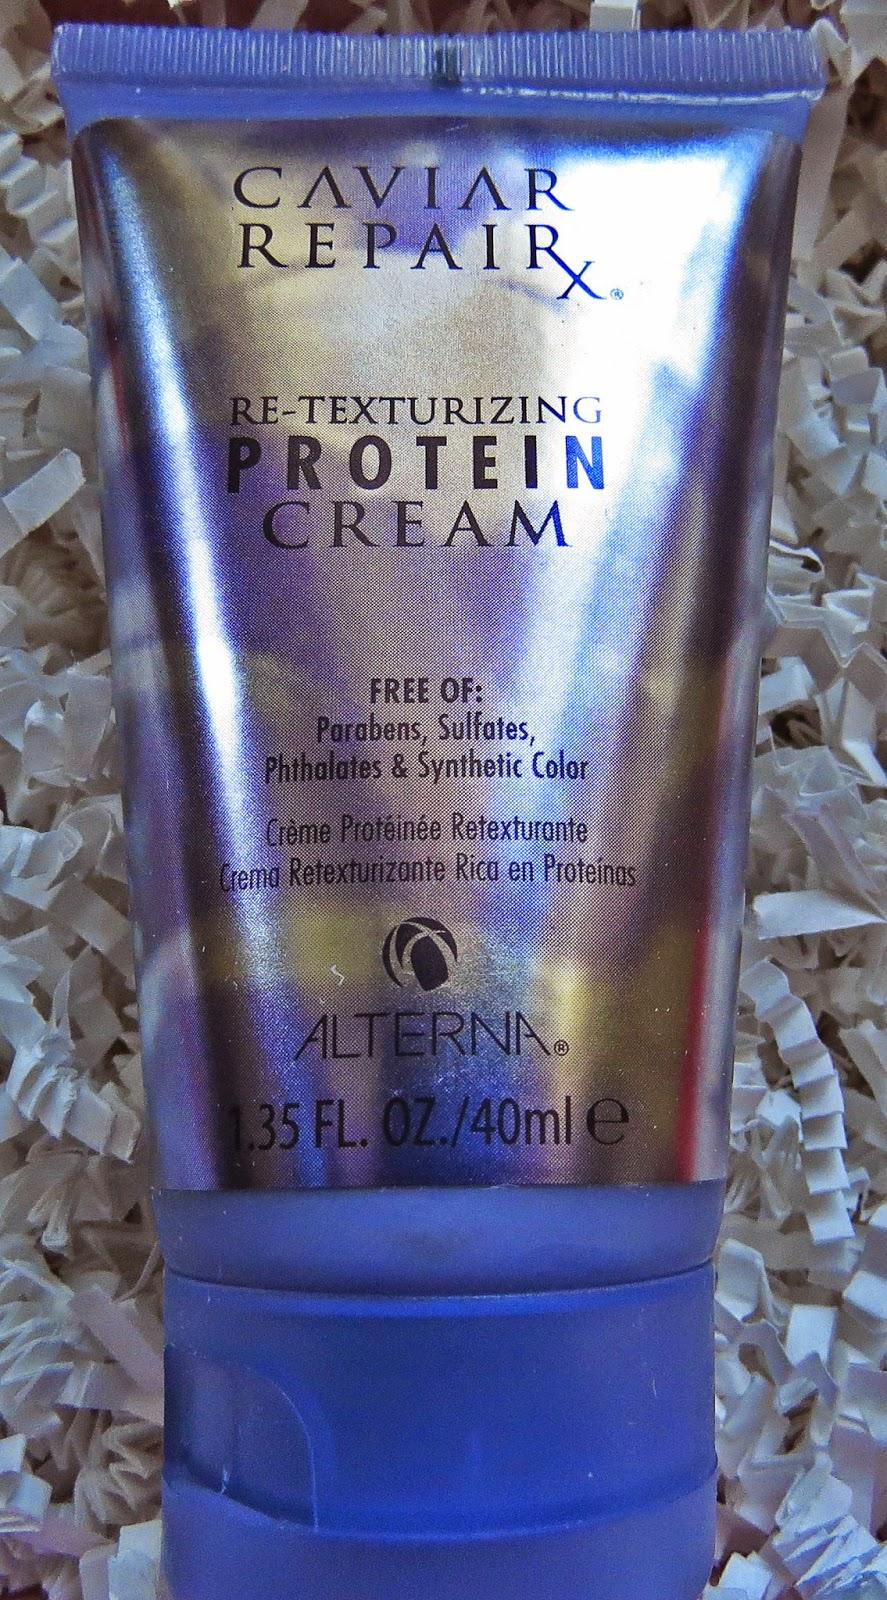 Alterna Caviar Repairx Re-texturing Protein Cream